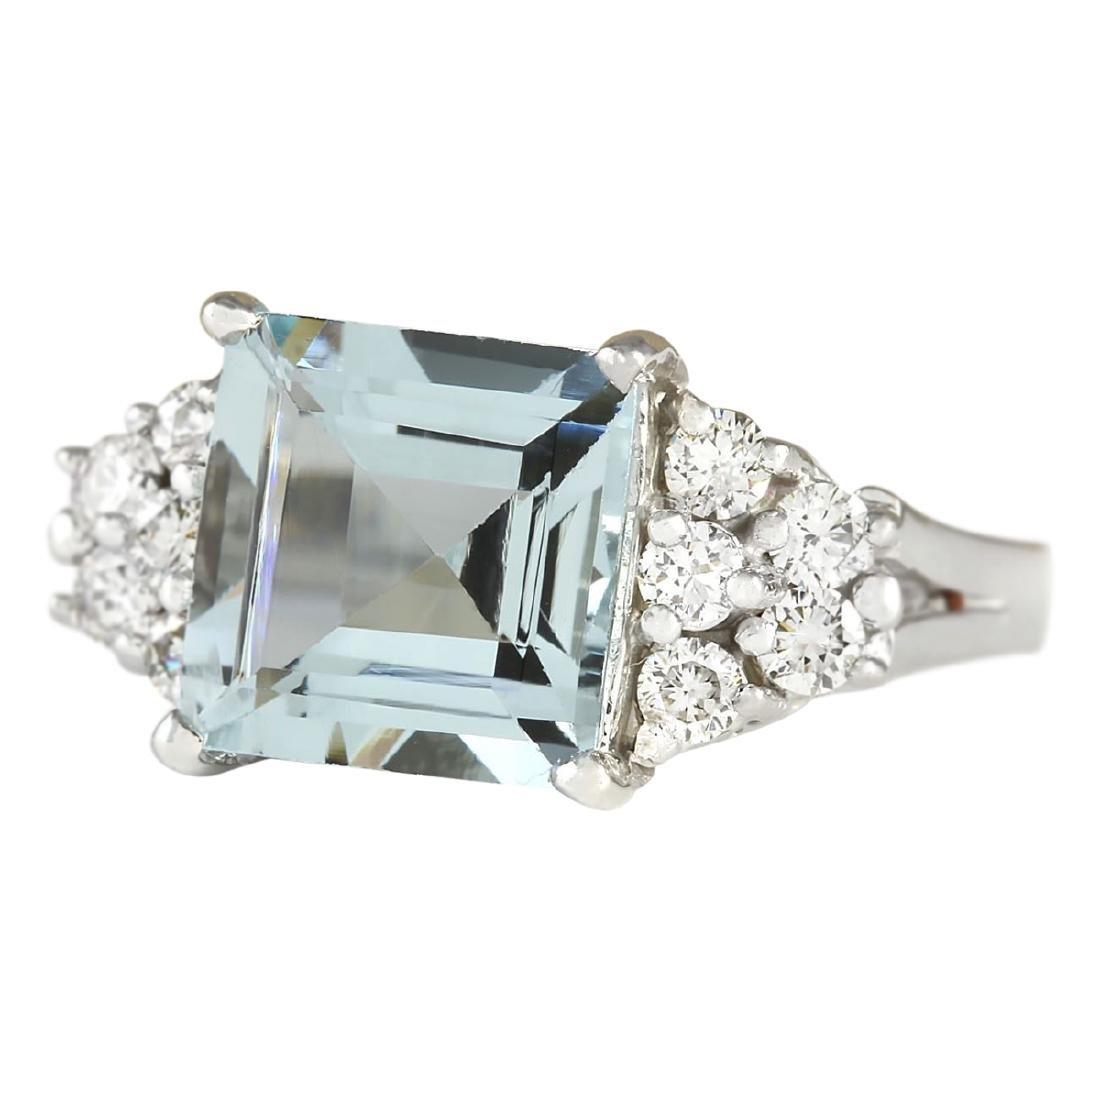 3.40 CTW Natural Aquamarine And Diamond Ring In 18K - 2